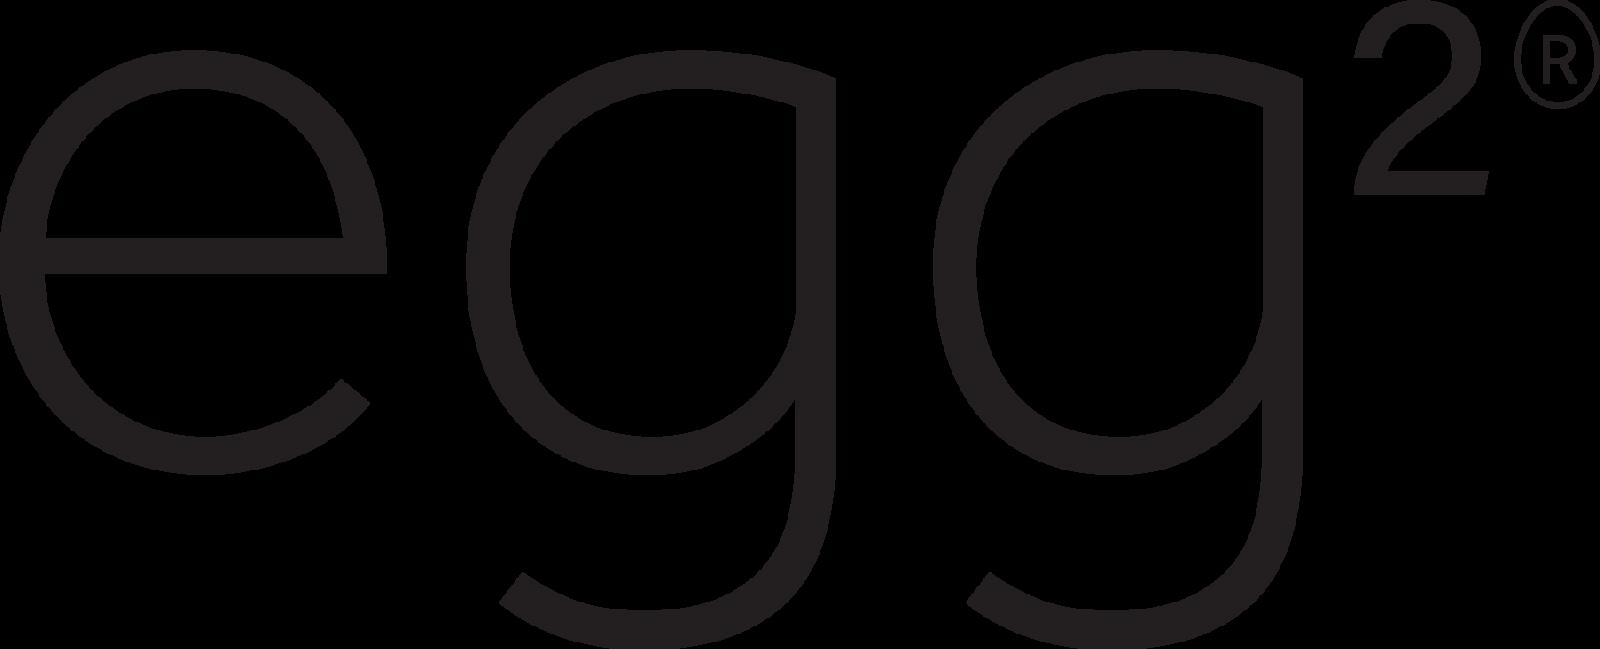 DadCon Digital 2020, Egg2 logo v2 black 1600x649%, %